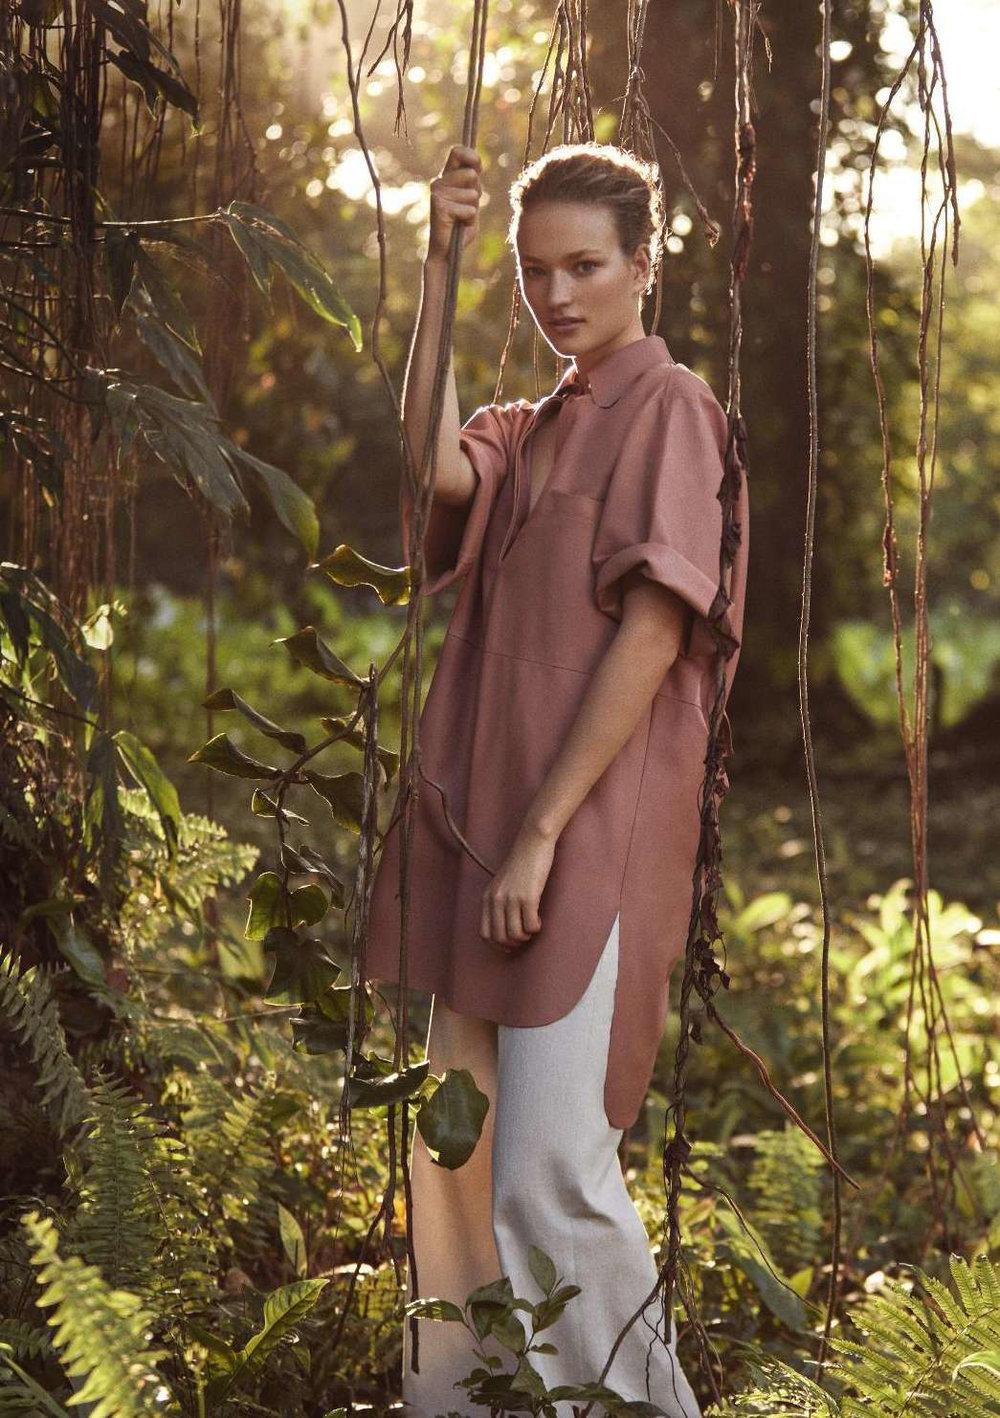 Sophia Ahrens by Adam Franzino for Elle Germany Feb 2019 (4).jpg